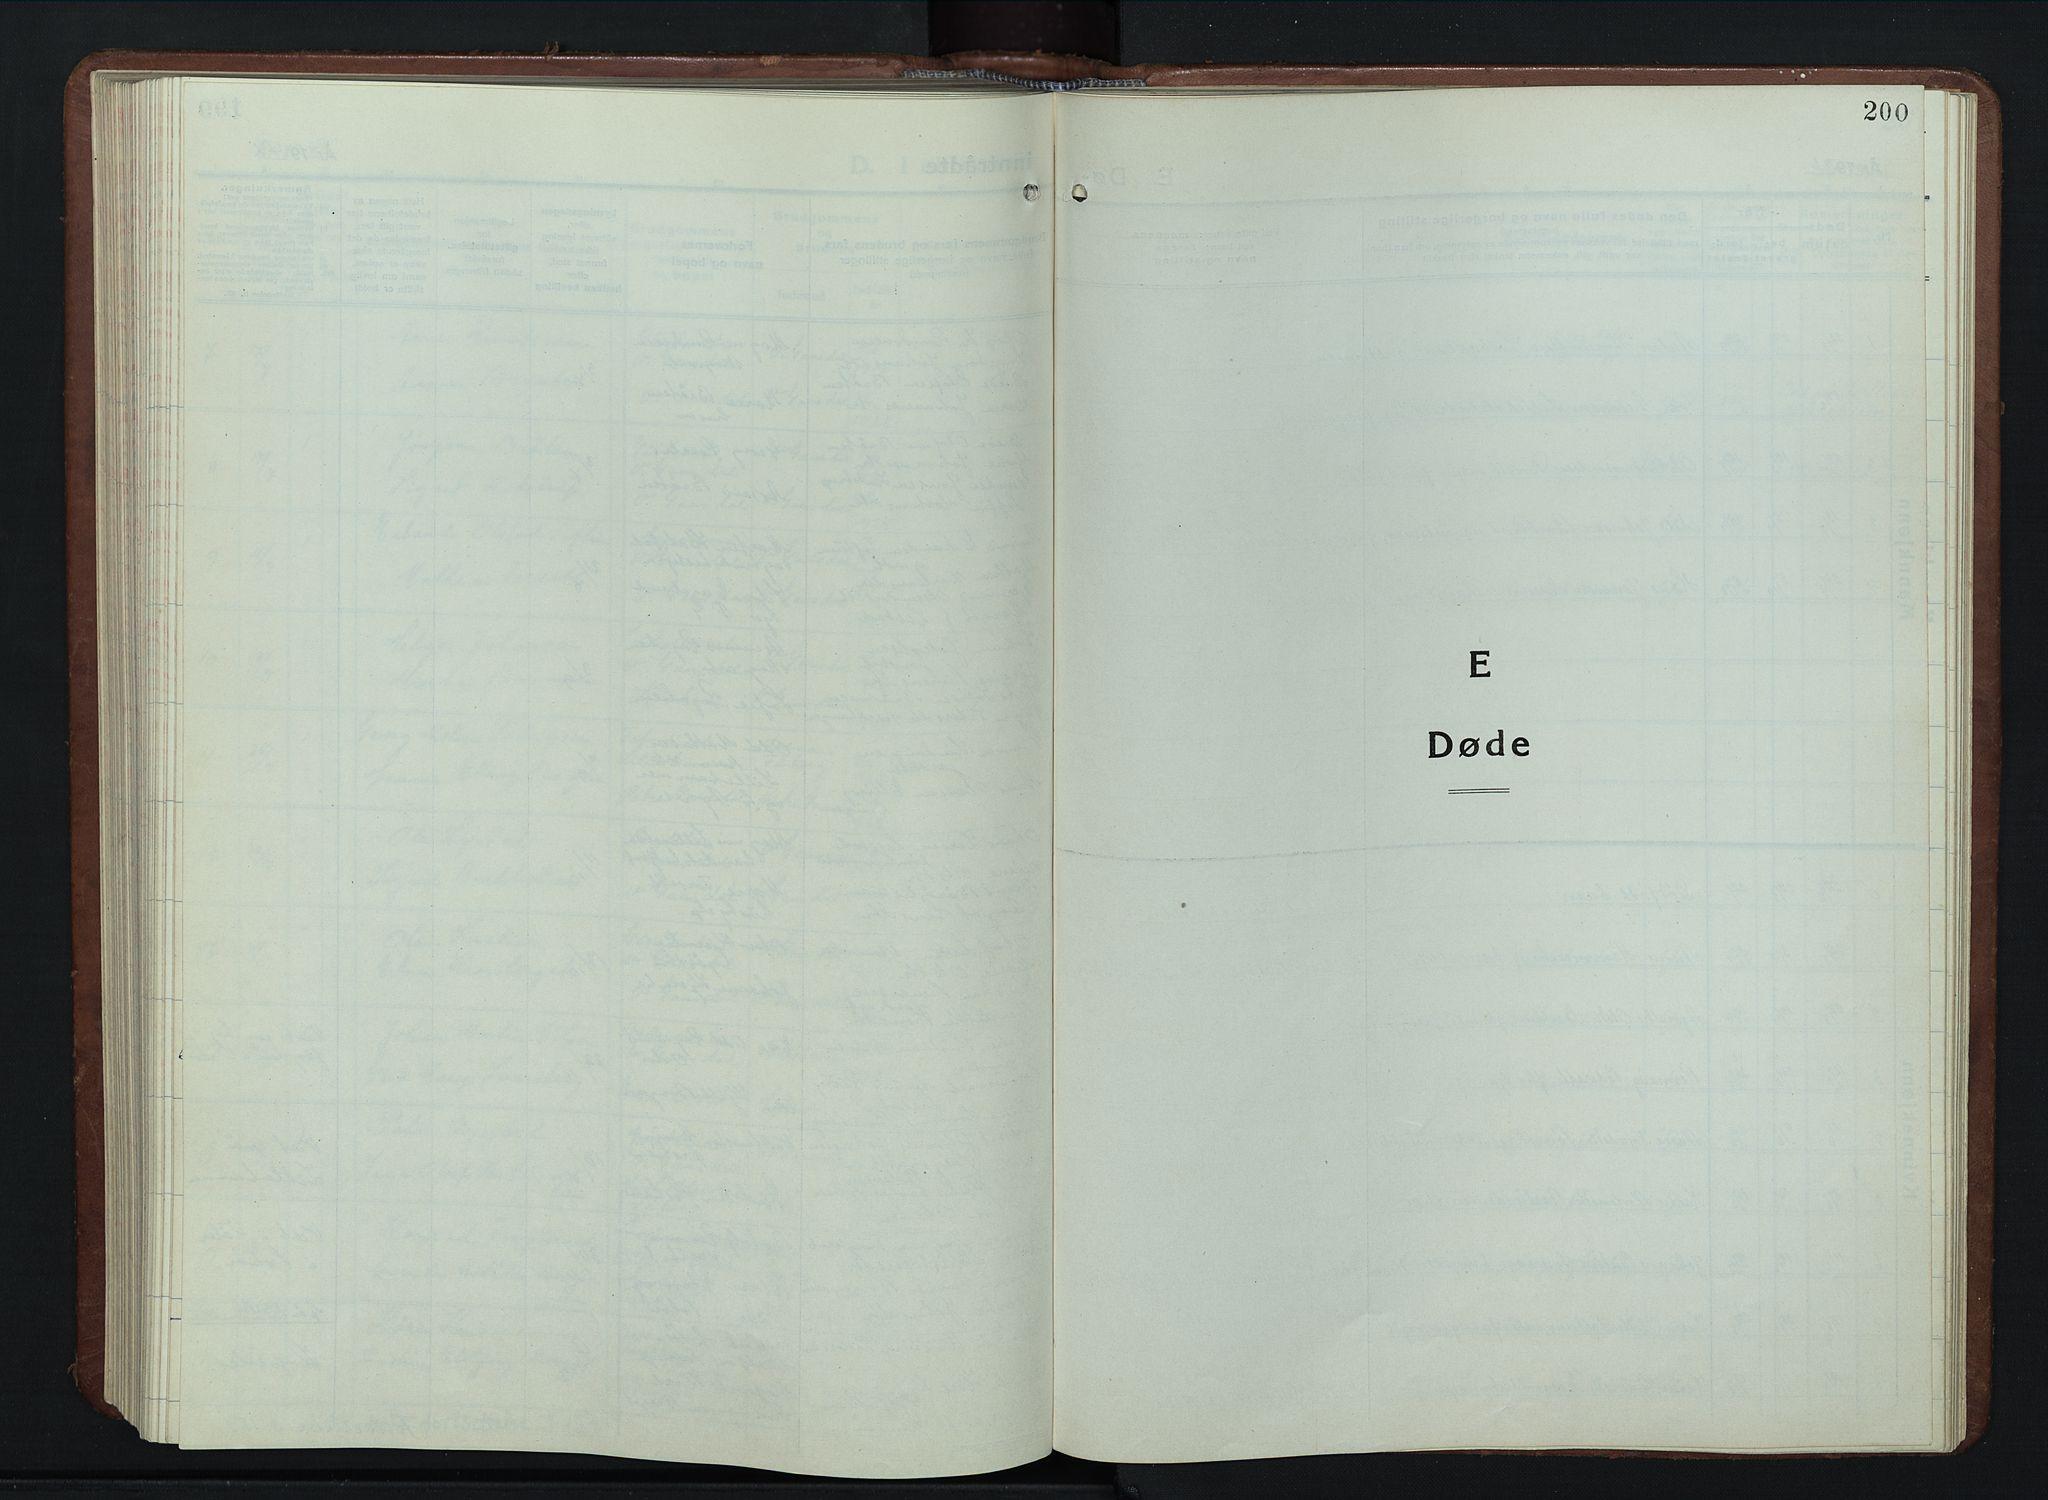 SAH, Vestre Gausdal prestekontor, Klokkerbok nr. 5, 1926-1955, s. 200